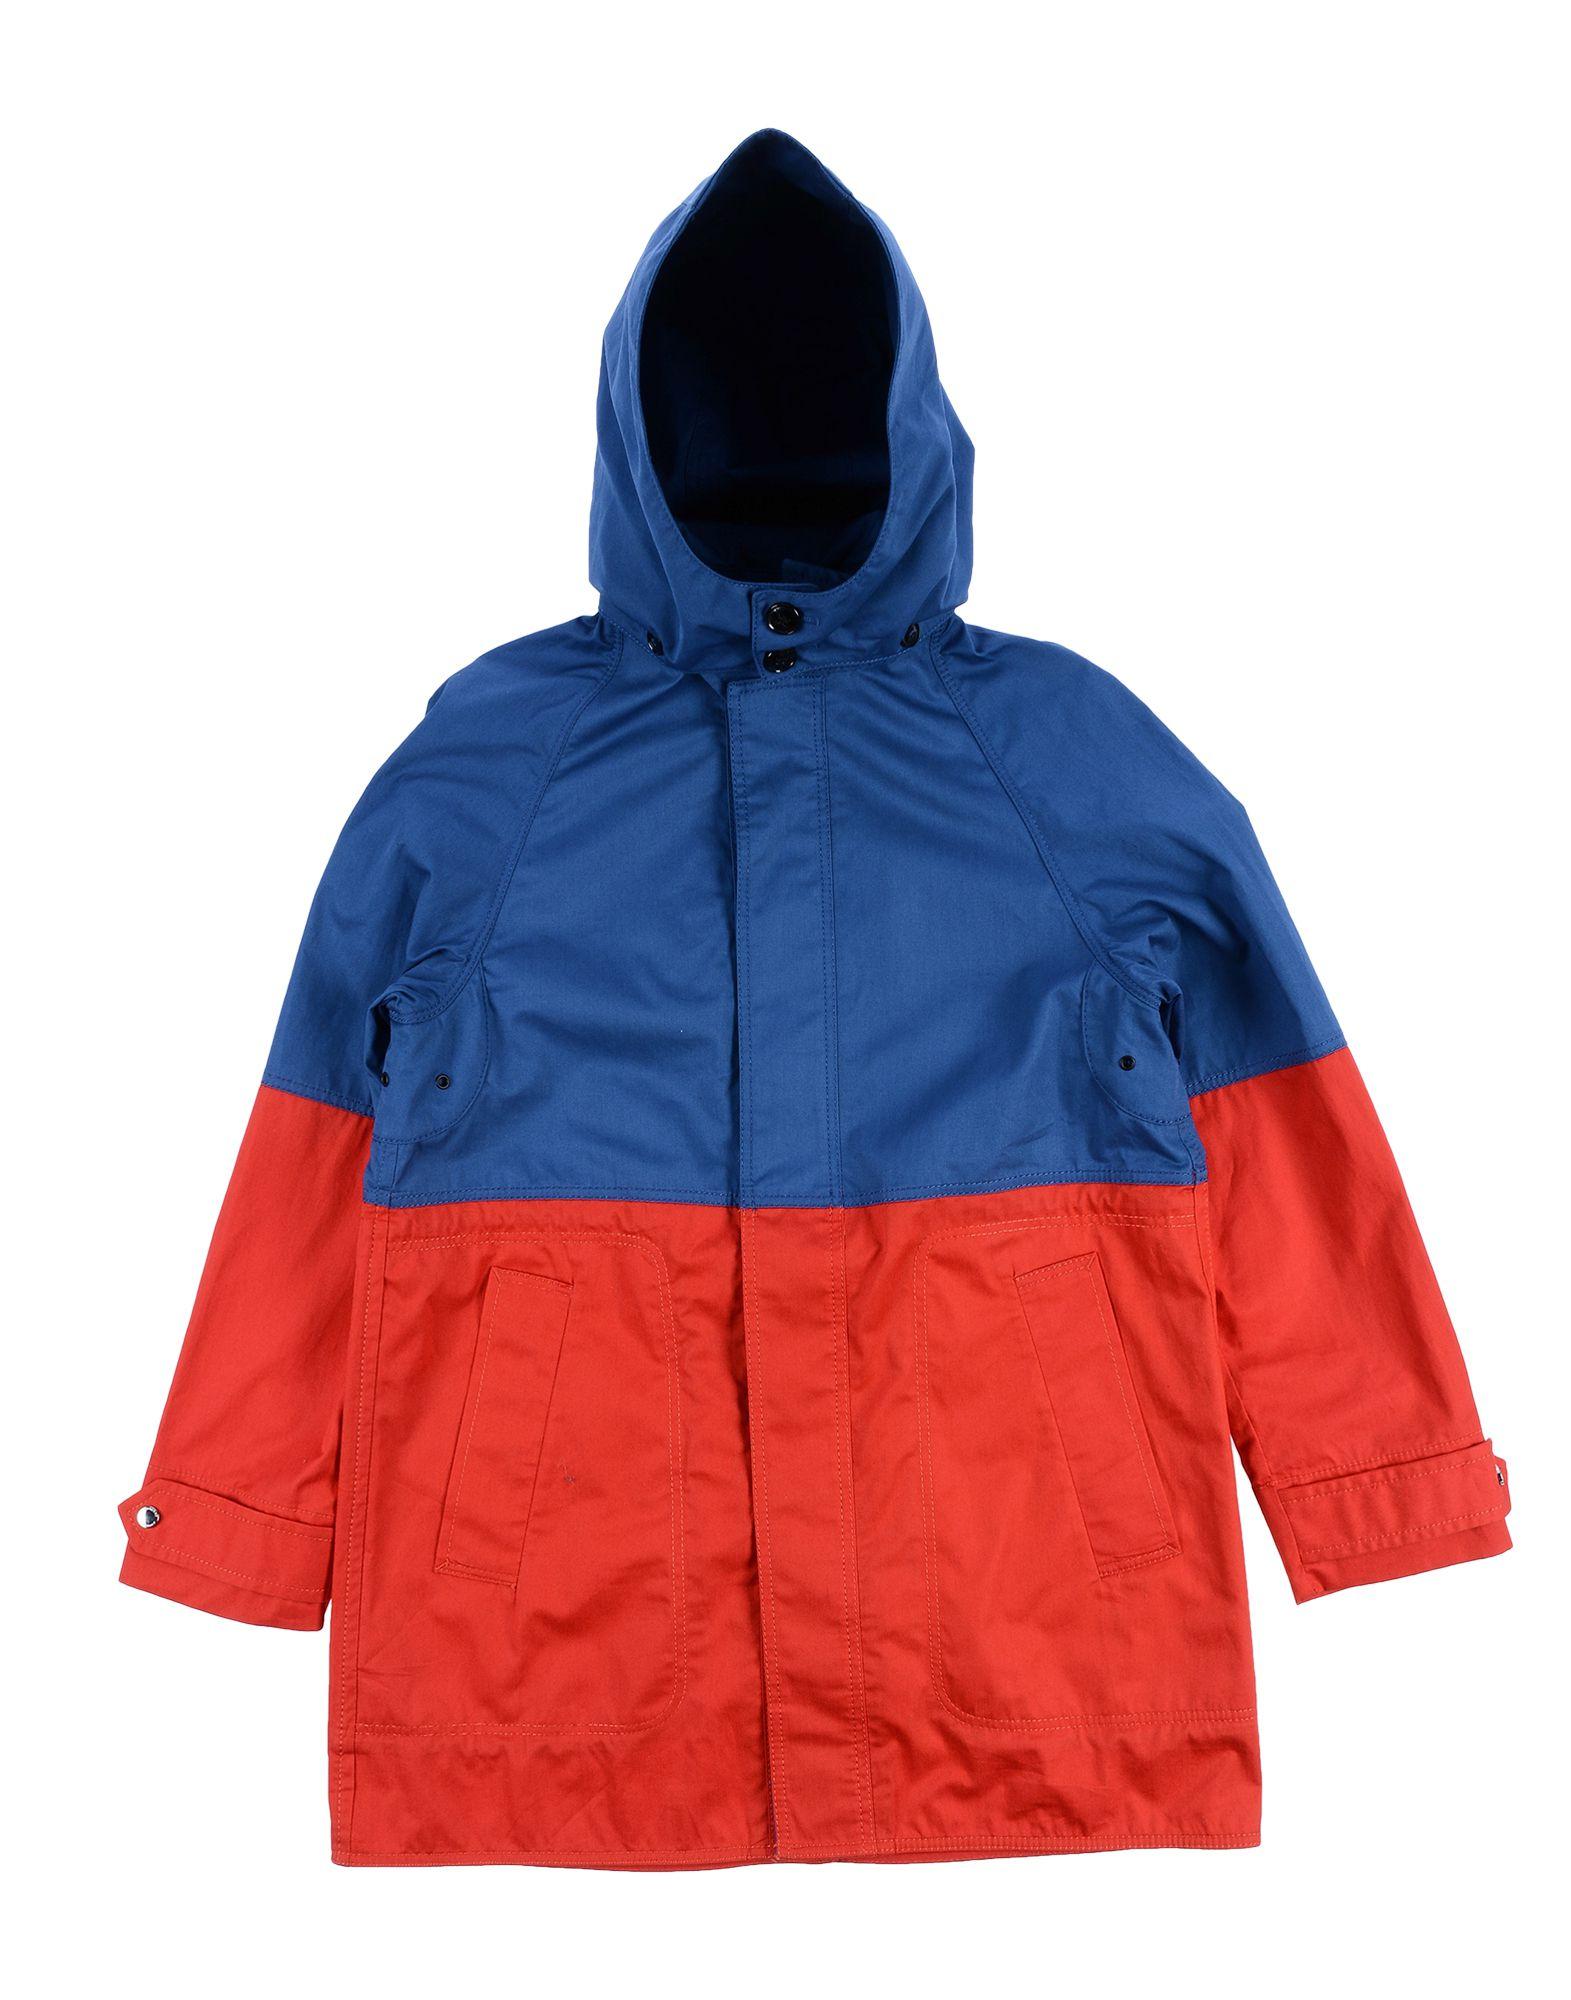 BURBERRY Overcoats - Item 41879829